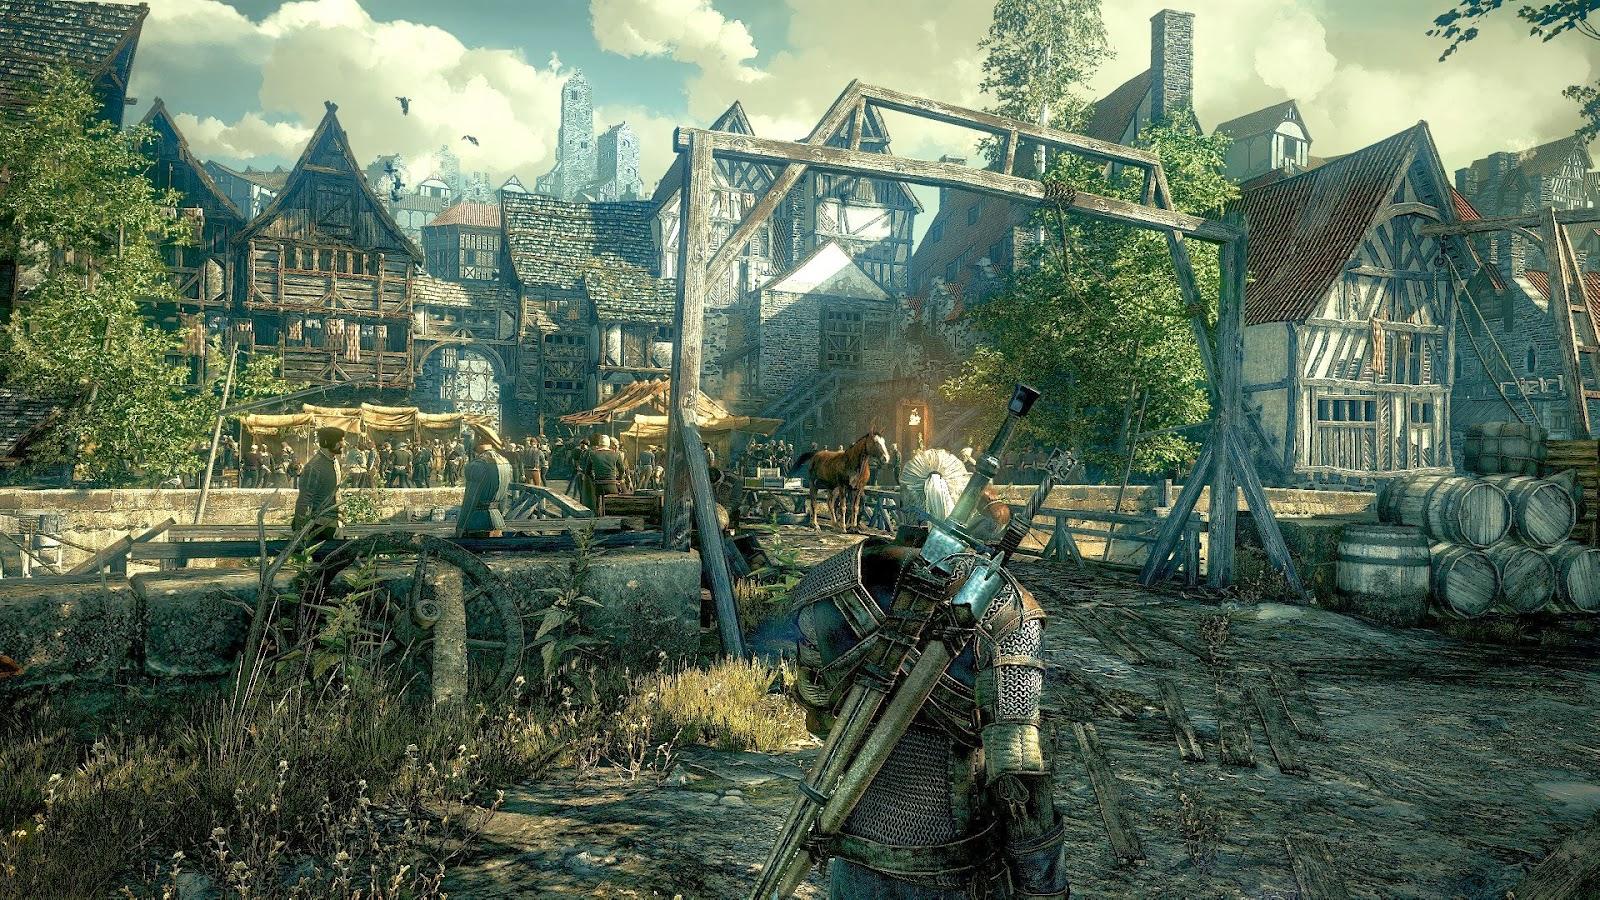 Increíbles escenarios en The Witcher 3